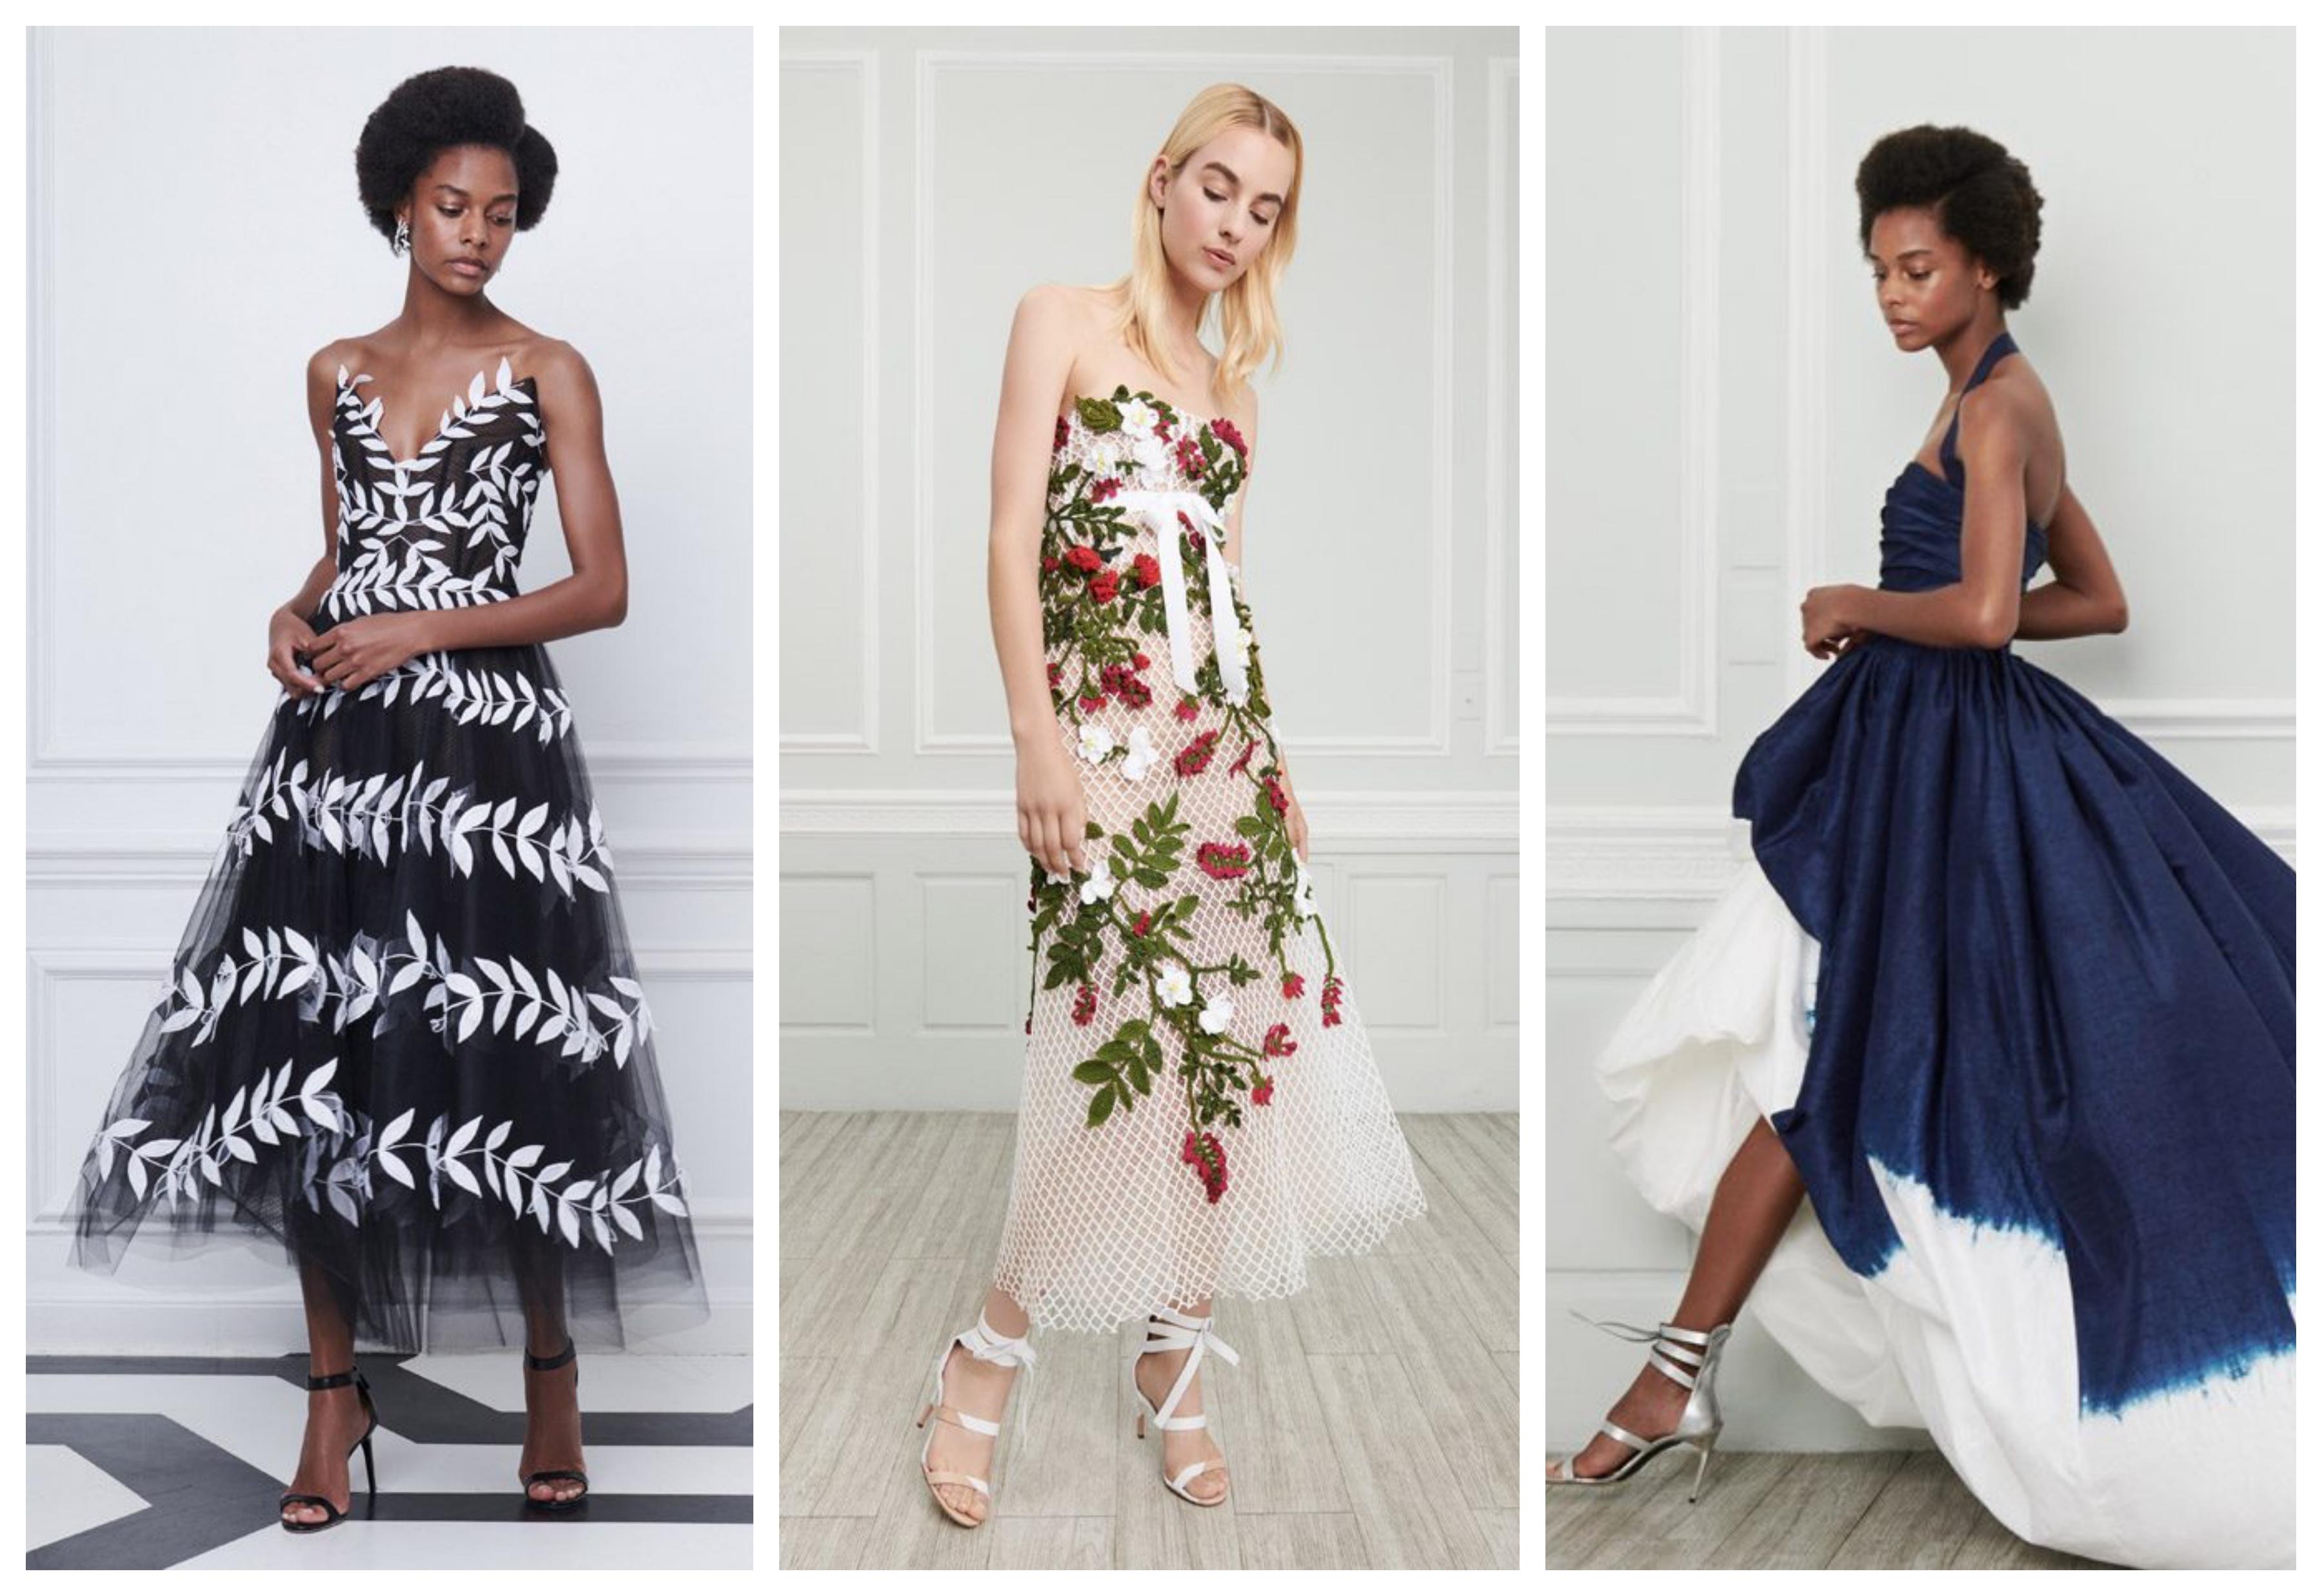 4c54e8e2ed0 Модные платья и сарафаны весна - лето 2019 года (79 фото) - Just clothes